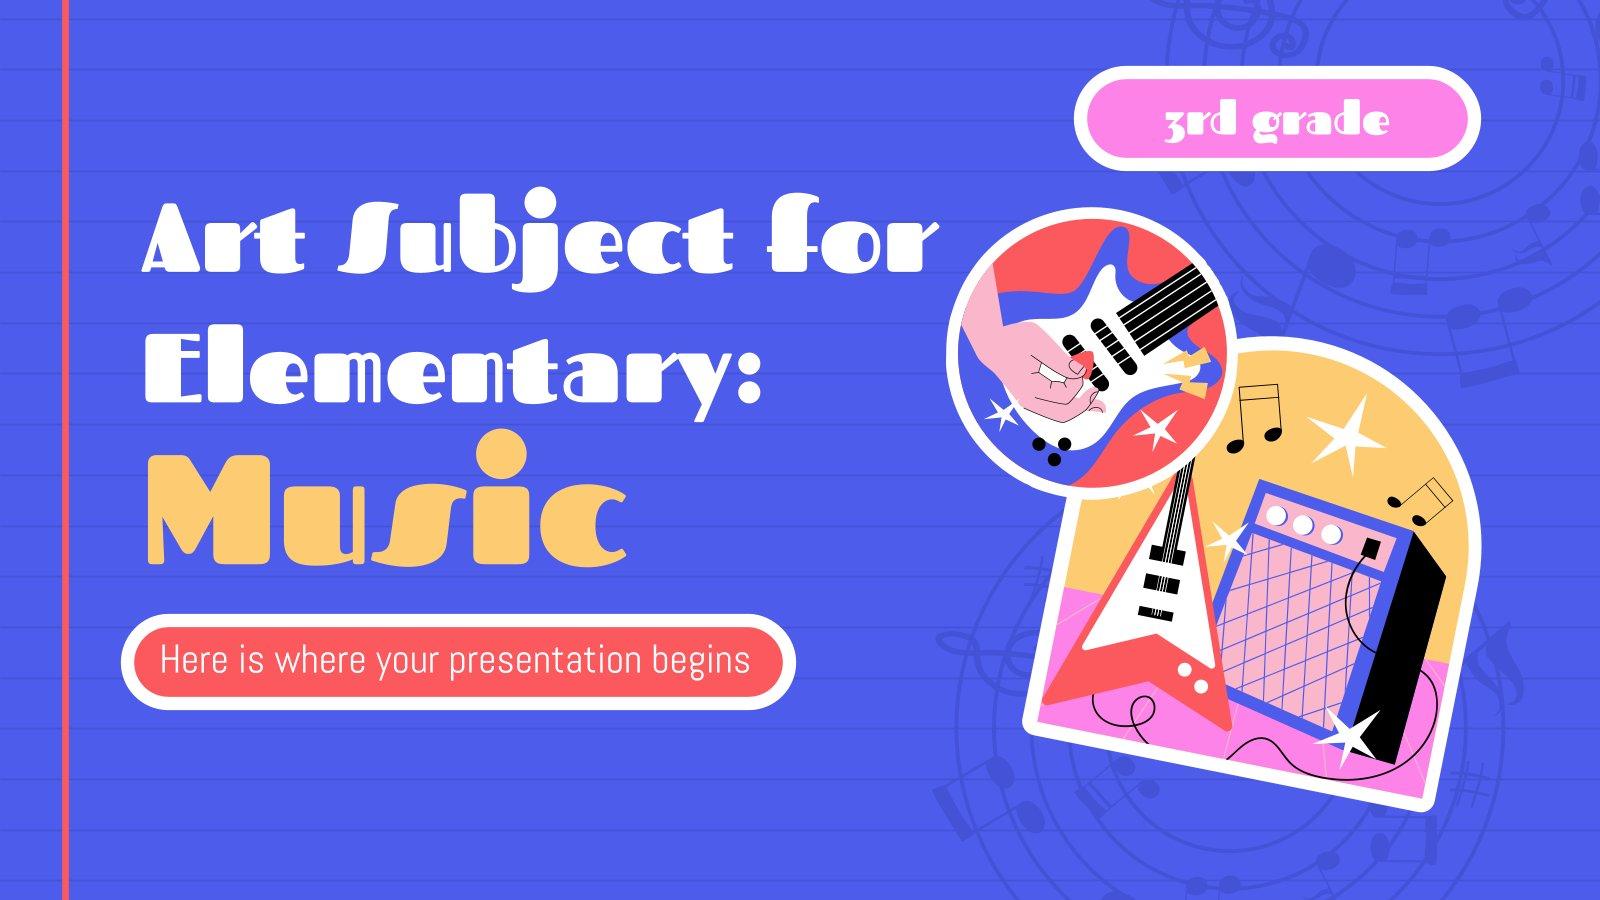 Art Subject for Elementary - 3rd Grade: Music presentation template